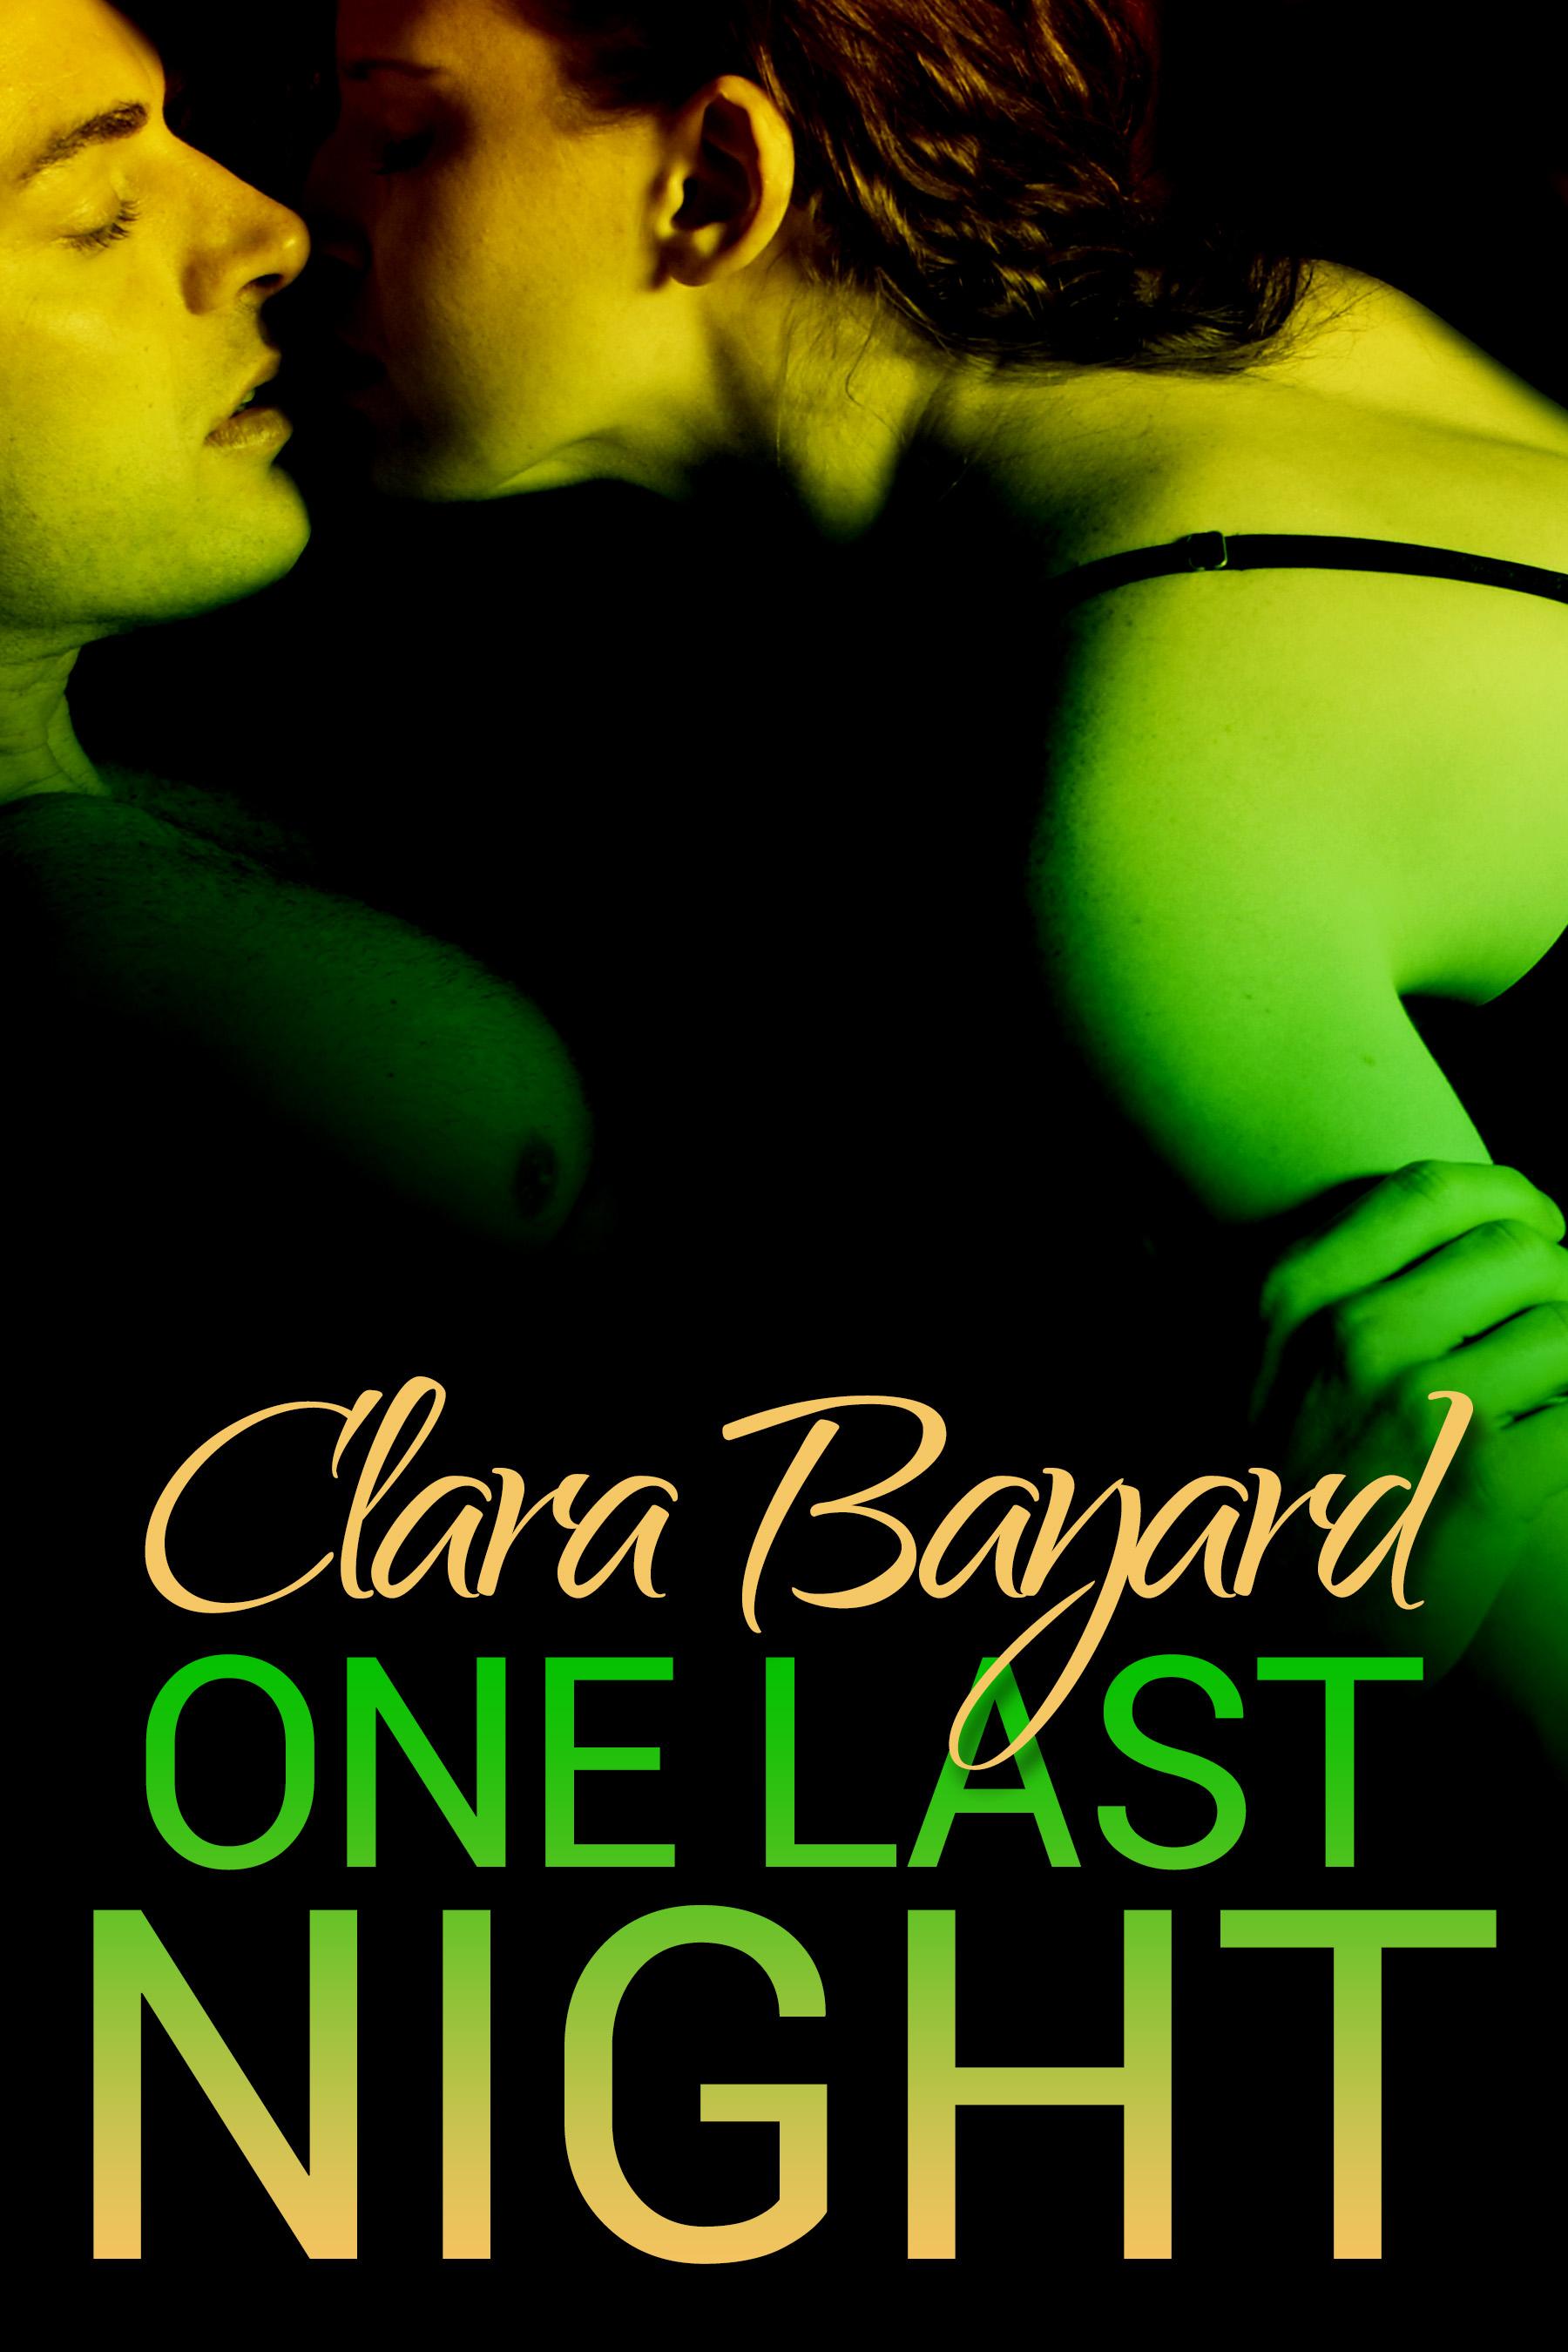 Clara Bayard - One Last Night (One Night of Danger #3)